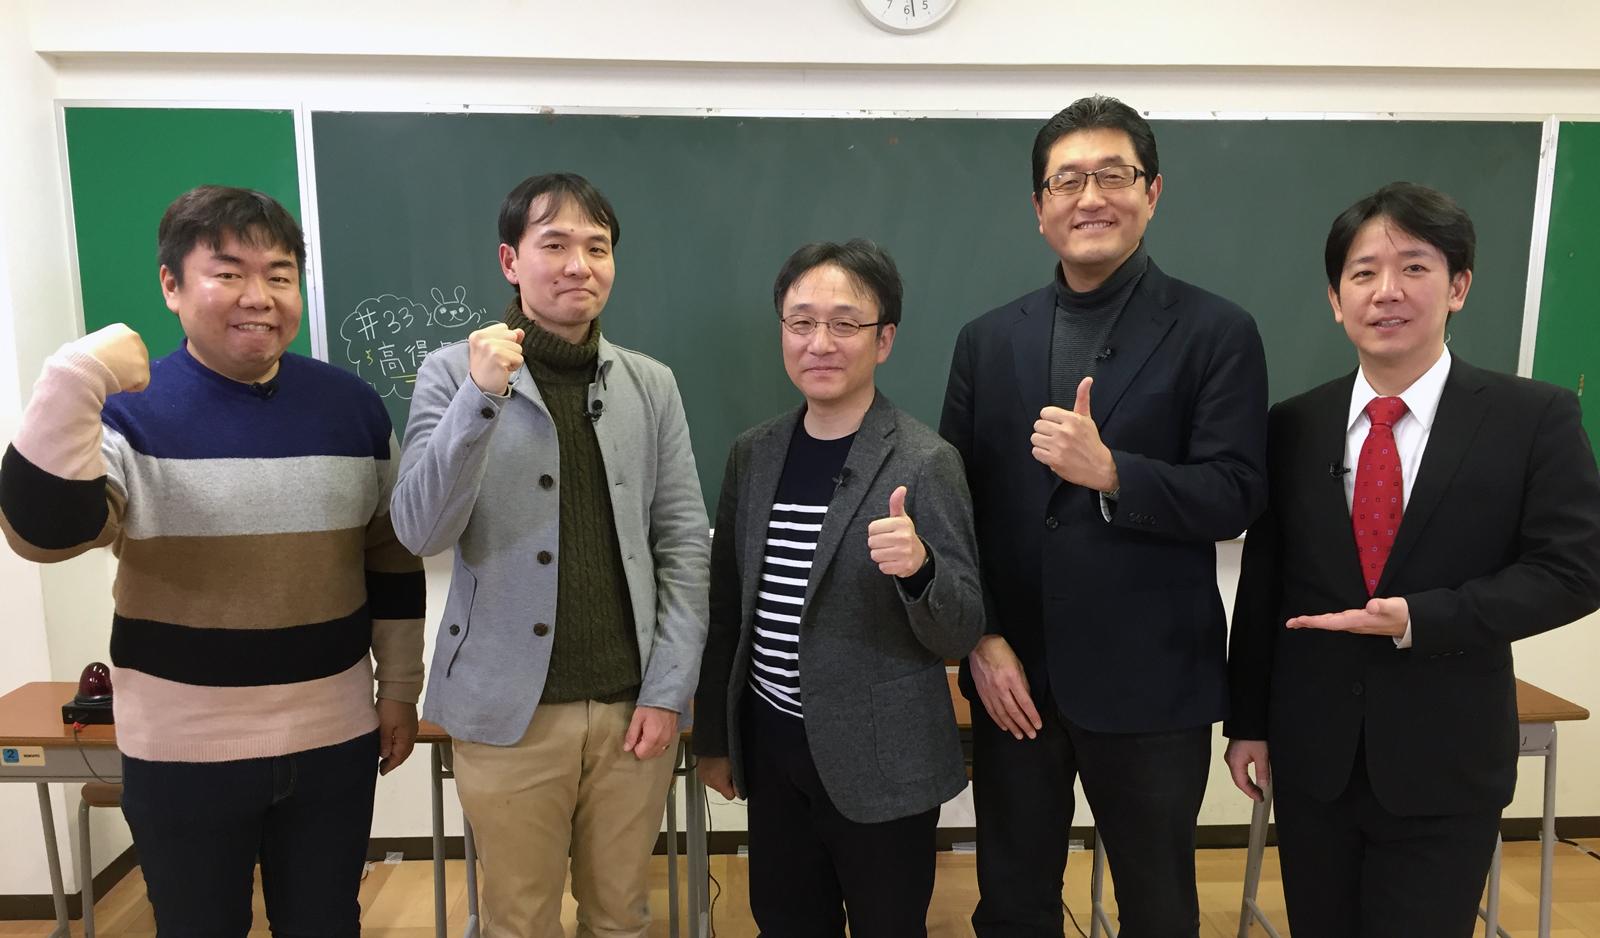 QUIZ JAPAN TVのオリジナルクイズ番組「魁!!クイズ塾」第33回は「高得点者大会」!